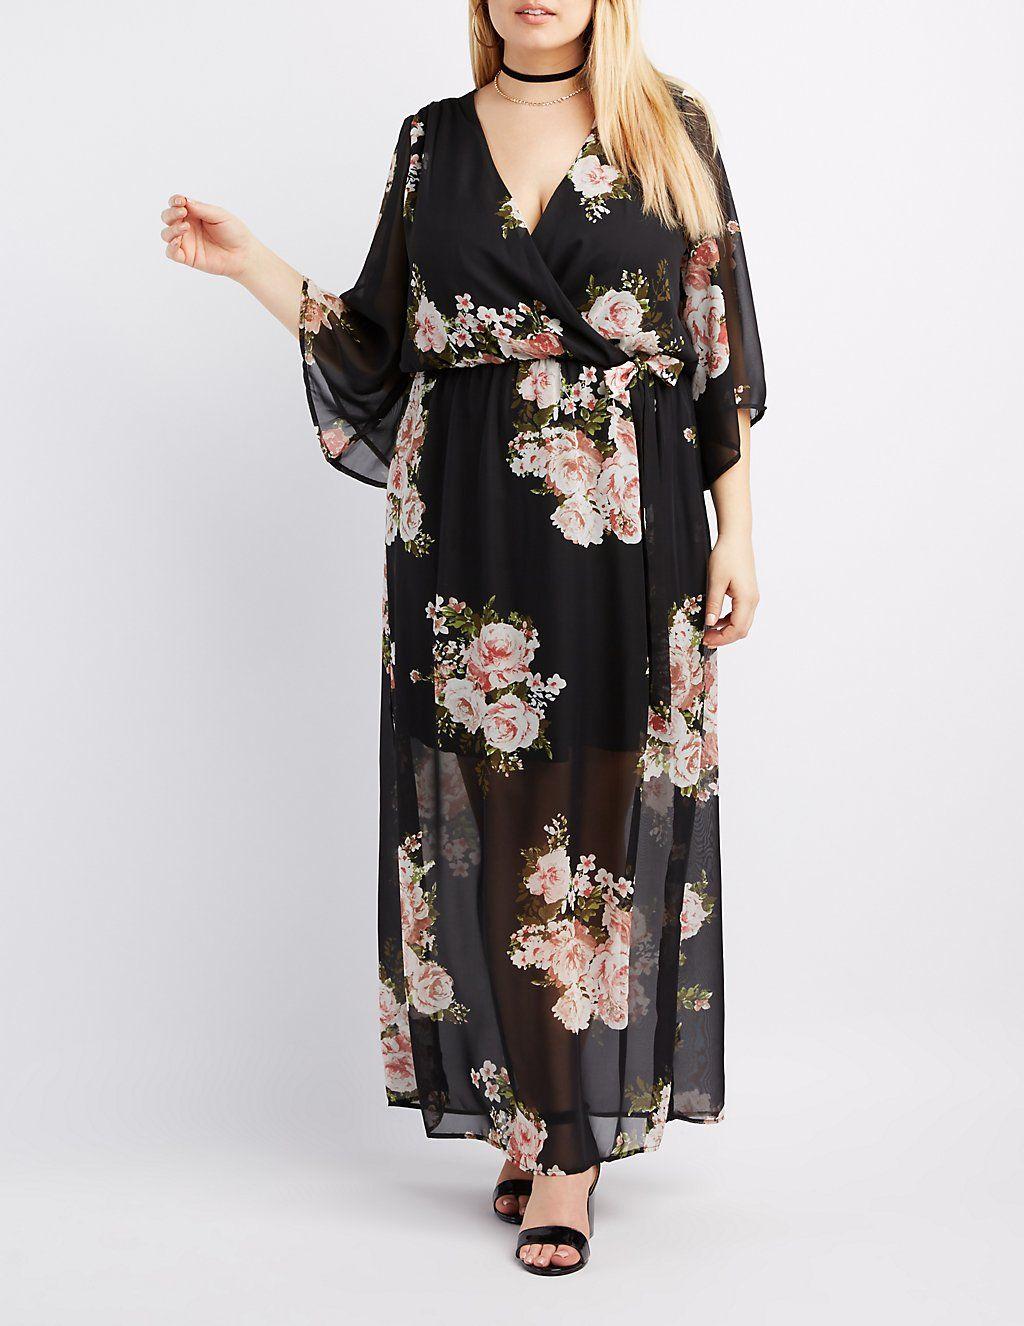 Plus Size Floral Kimono Sleeve Maxi Dress | Chic Curves | Maxi dress ...